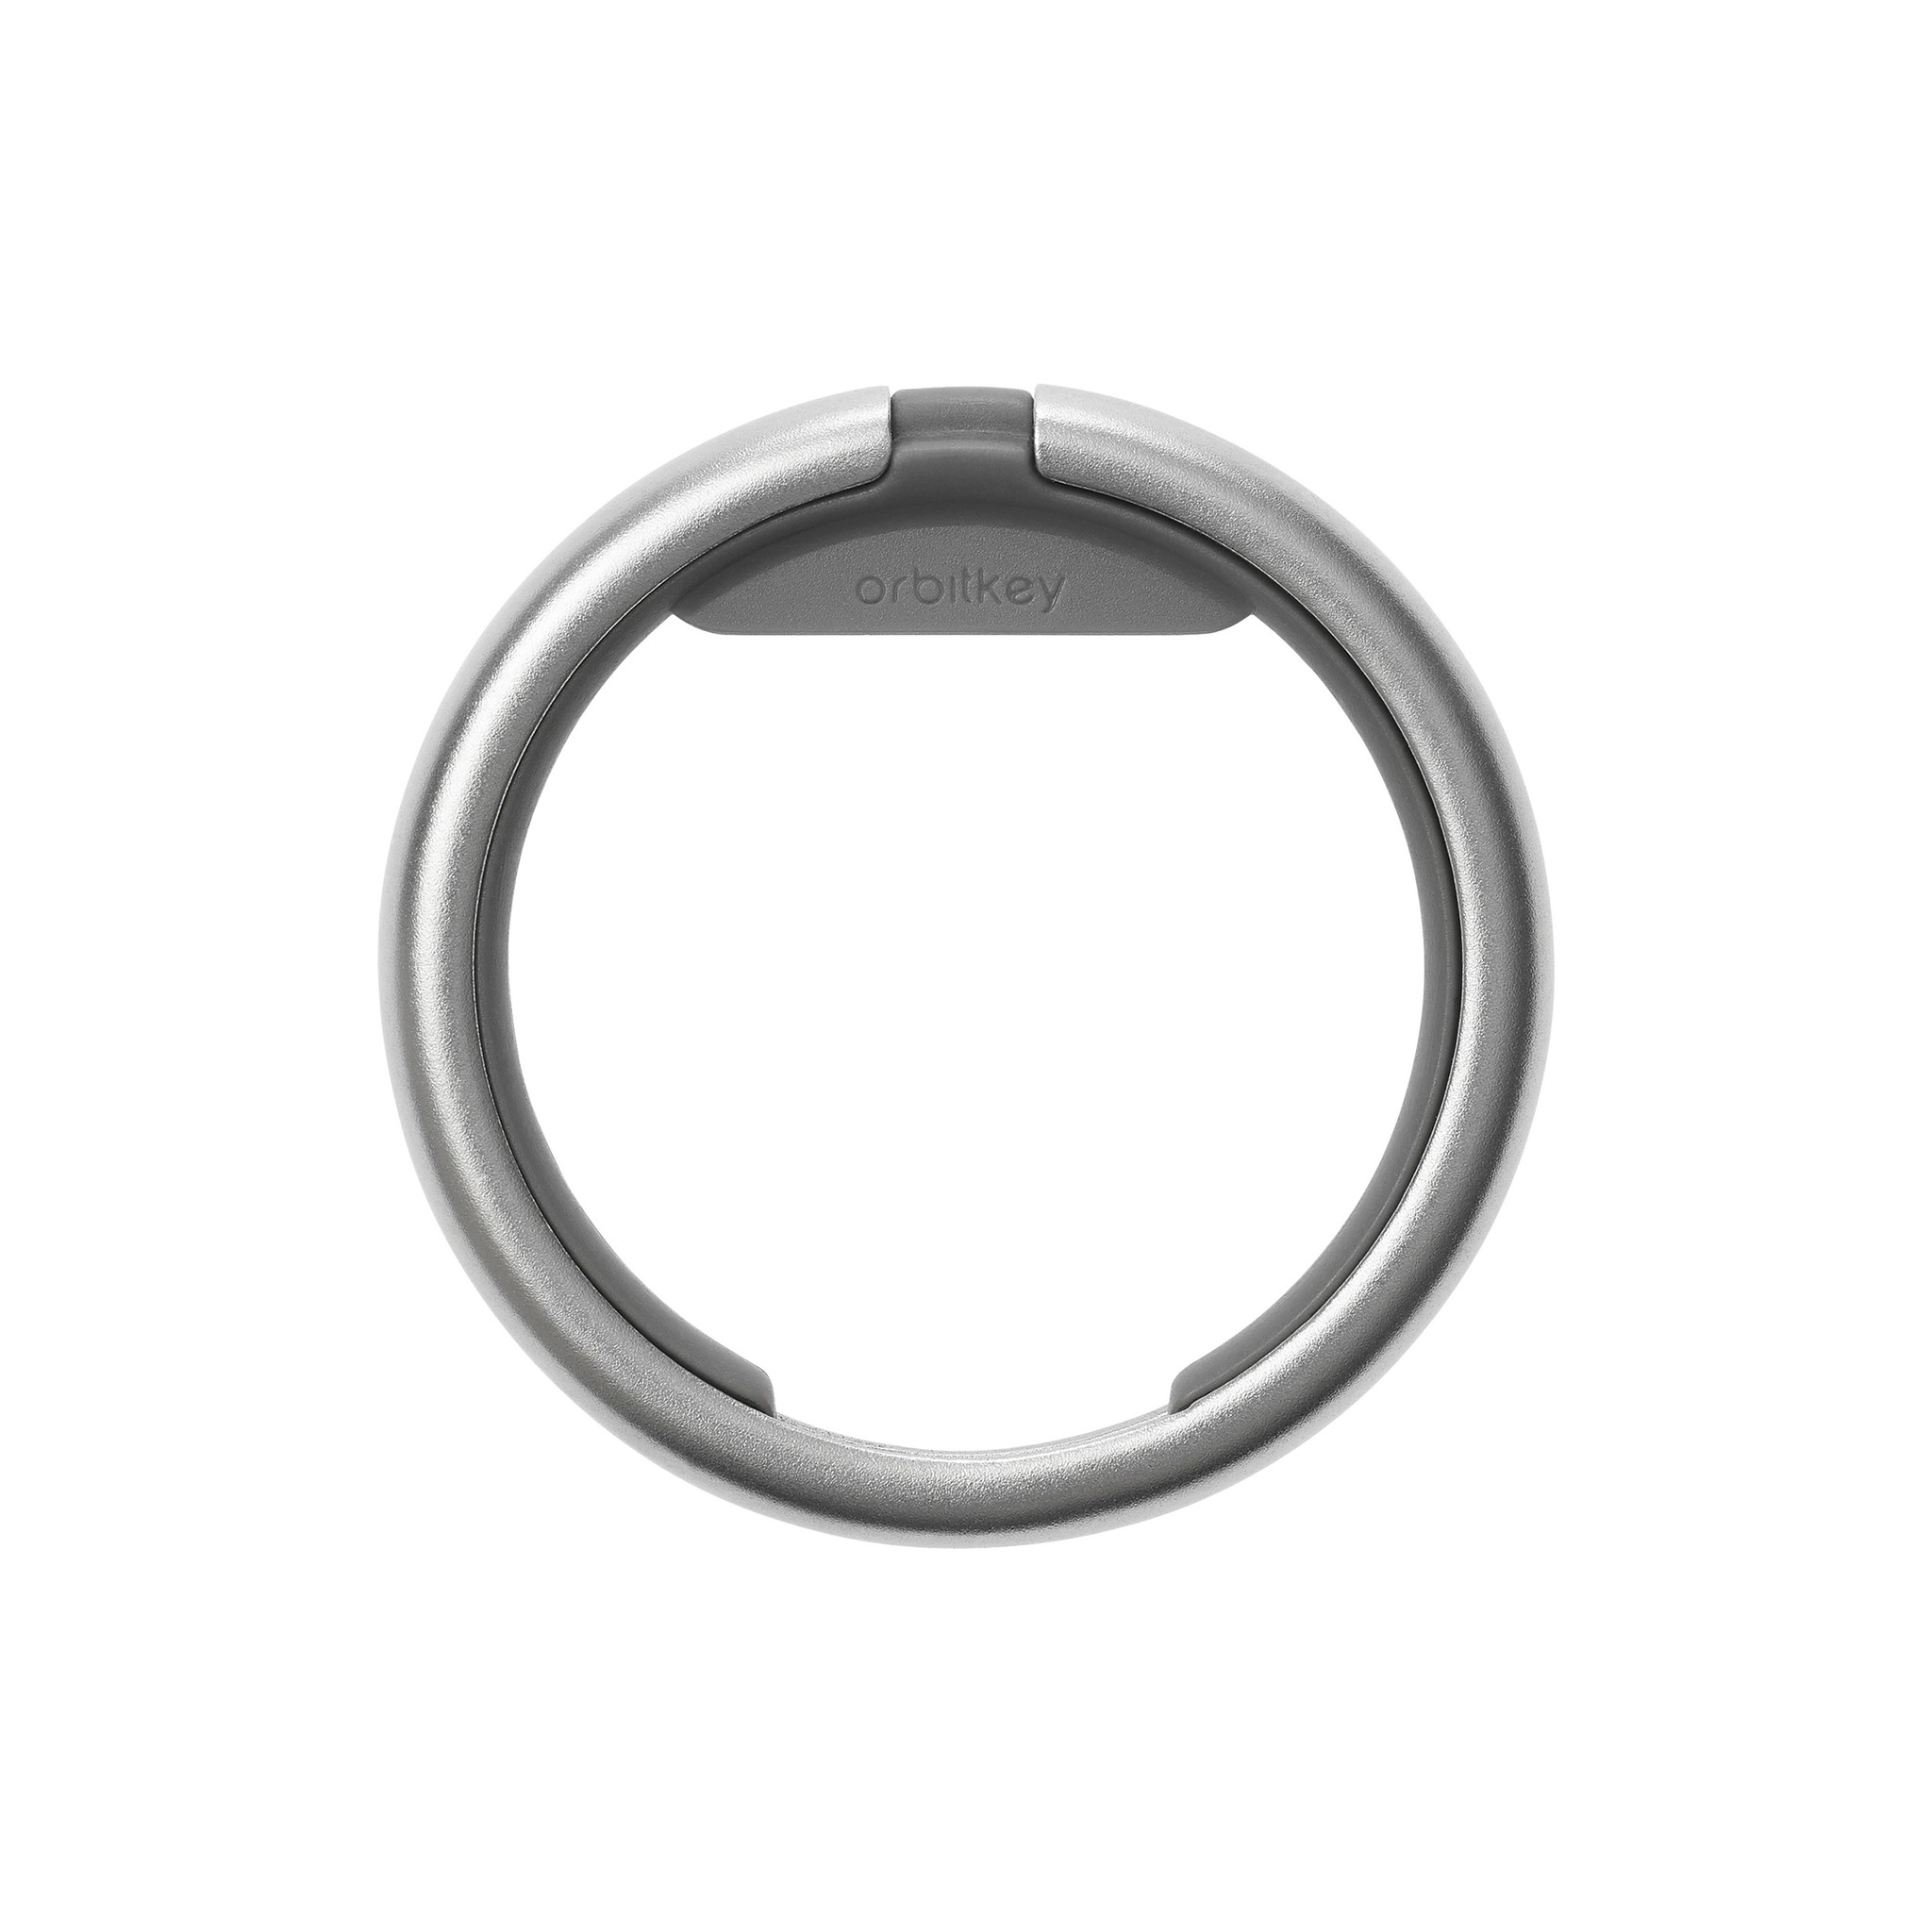 Orbitkey Accessoires Orbitkey Ring Charcoal